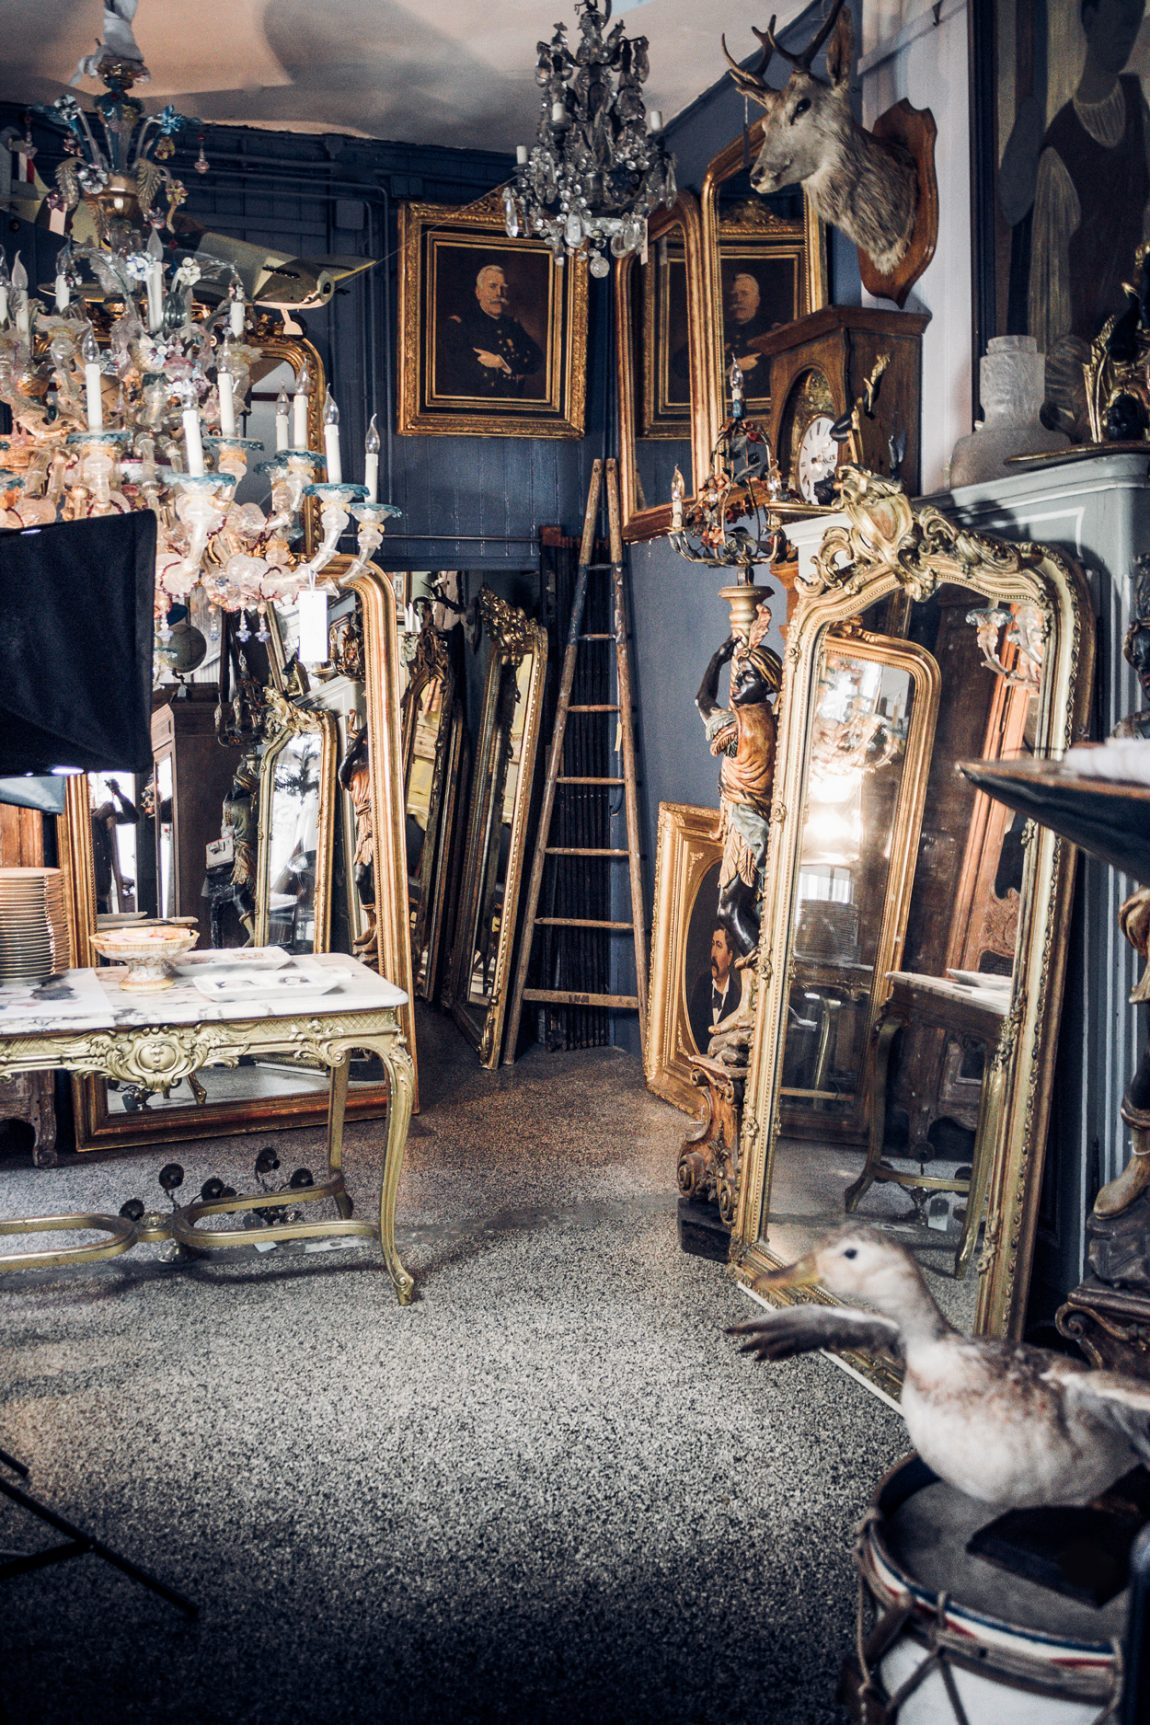 Decorative Antiques And Arts Wildschut Antiques Amsterdam